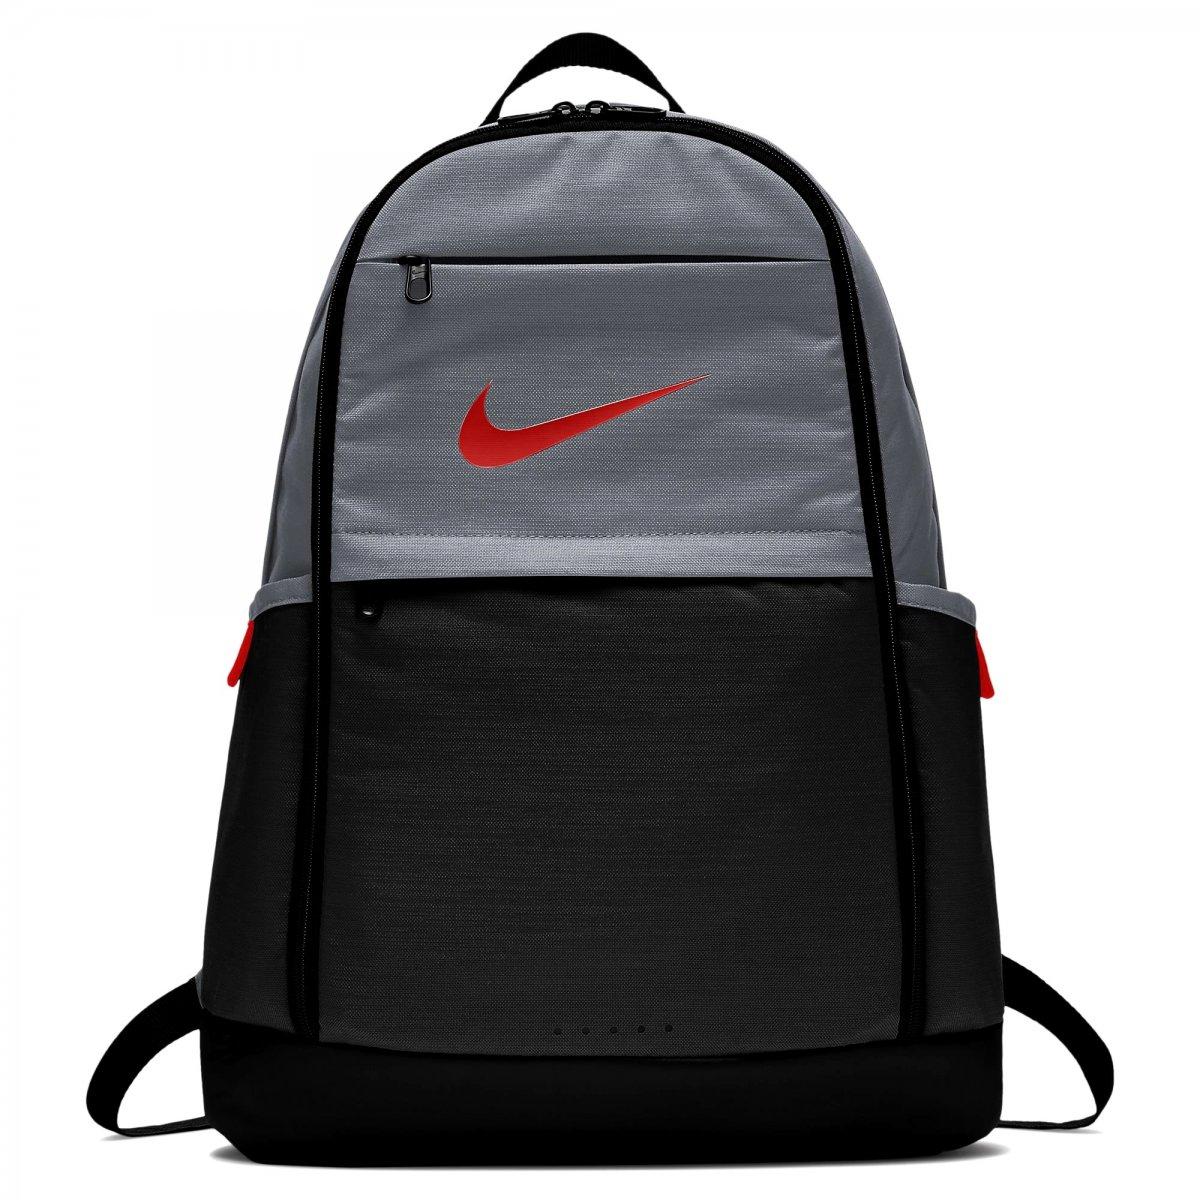 eb28d864d Mochila Nike Brasilia (Extra Grande) BA5892-065 - Cinza/Vermelho ...